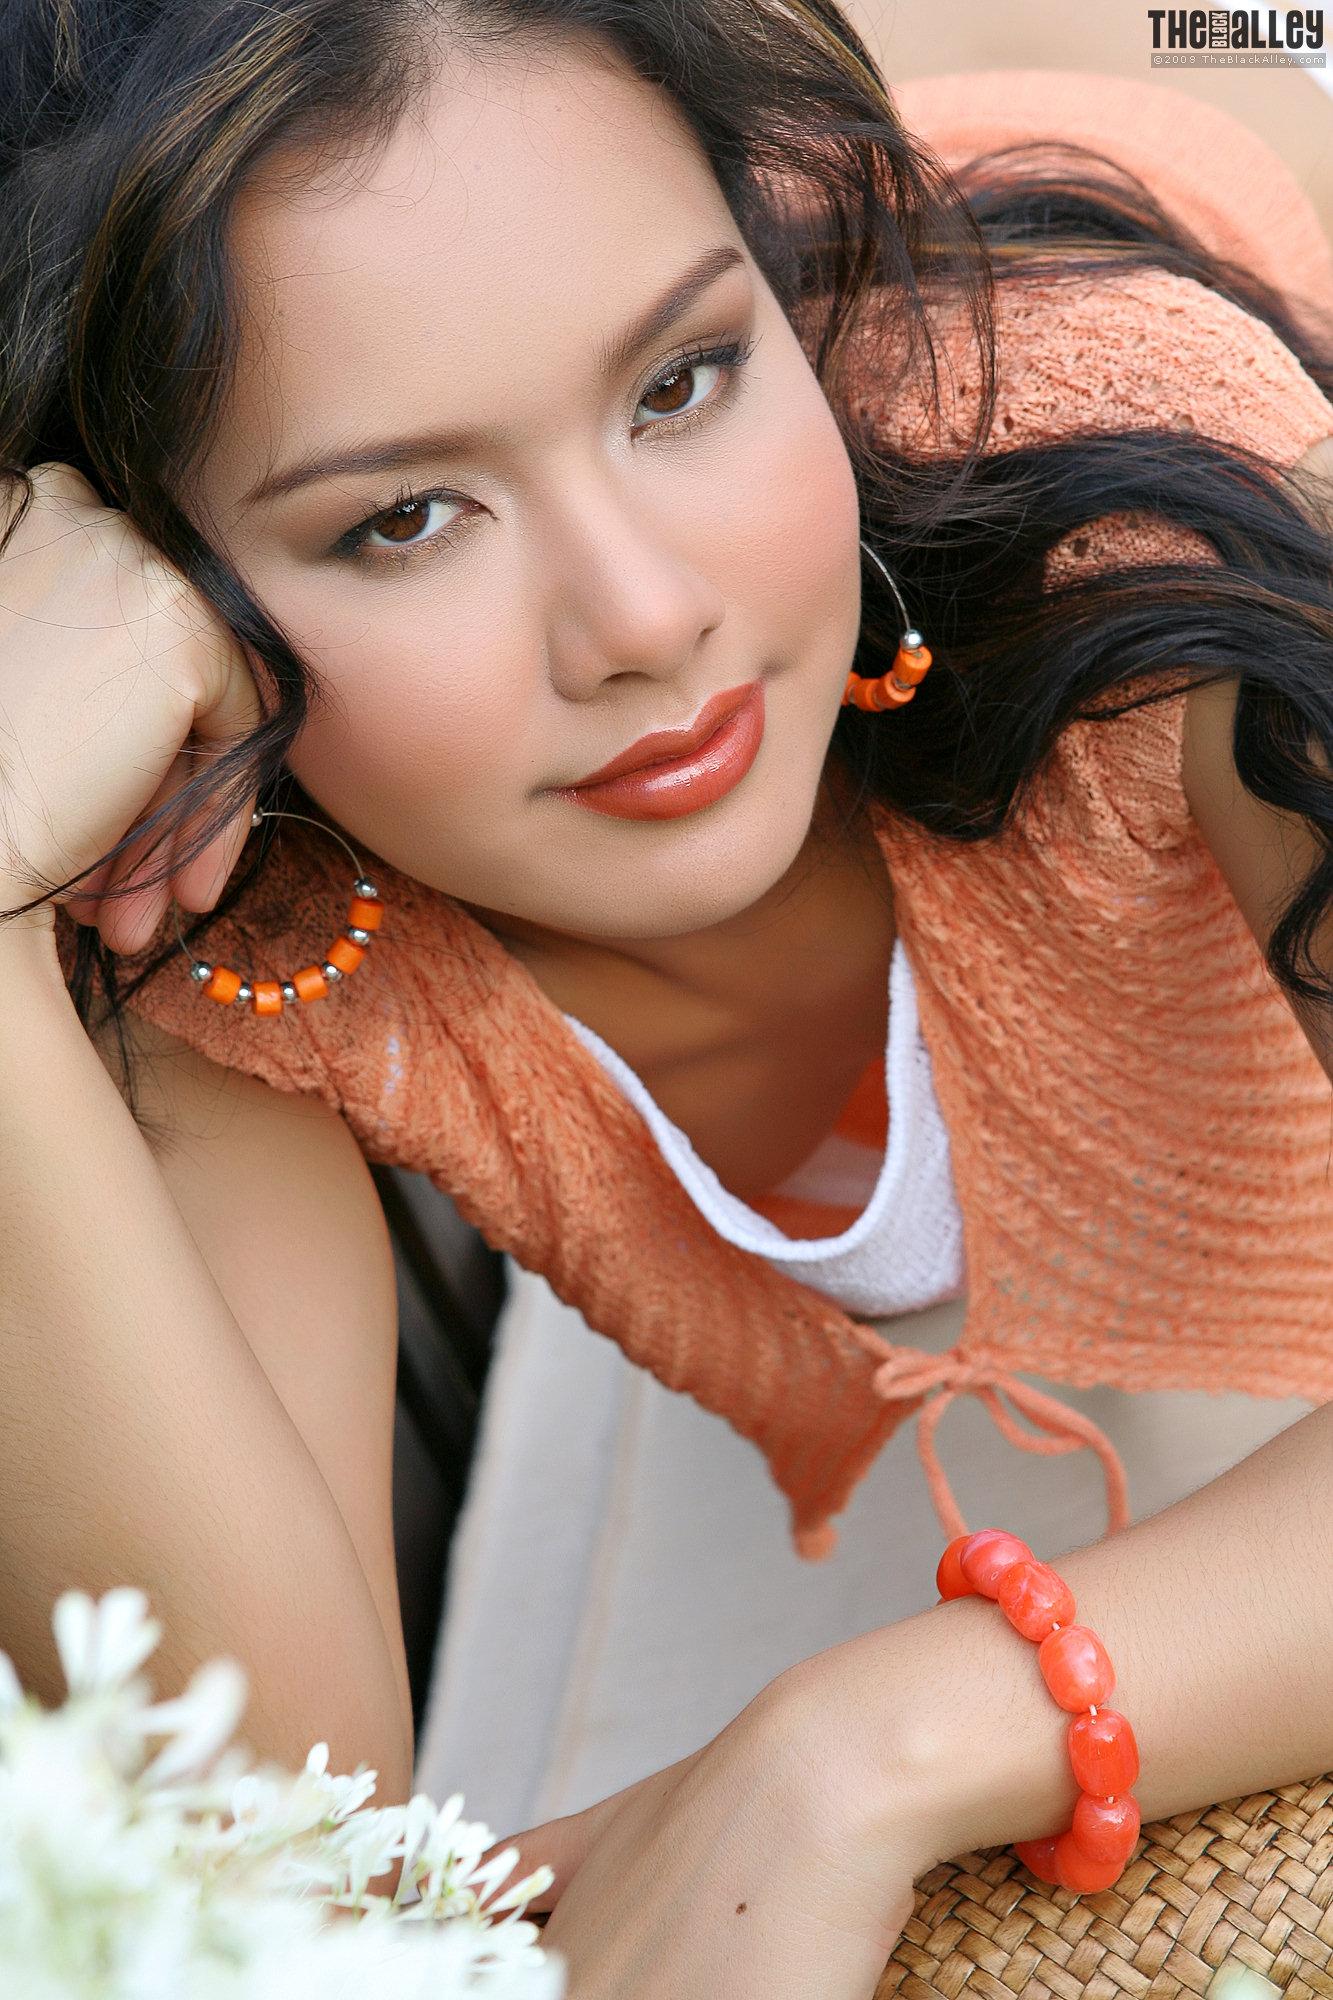 Jasmine Wang | Pretty Naked Phat Ass Asian | TheBlackAlley